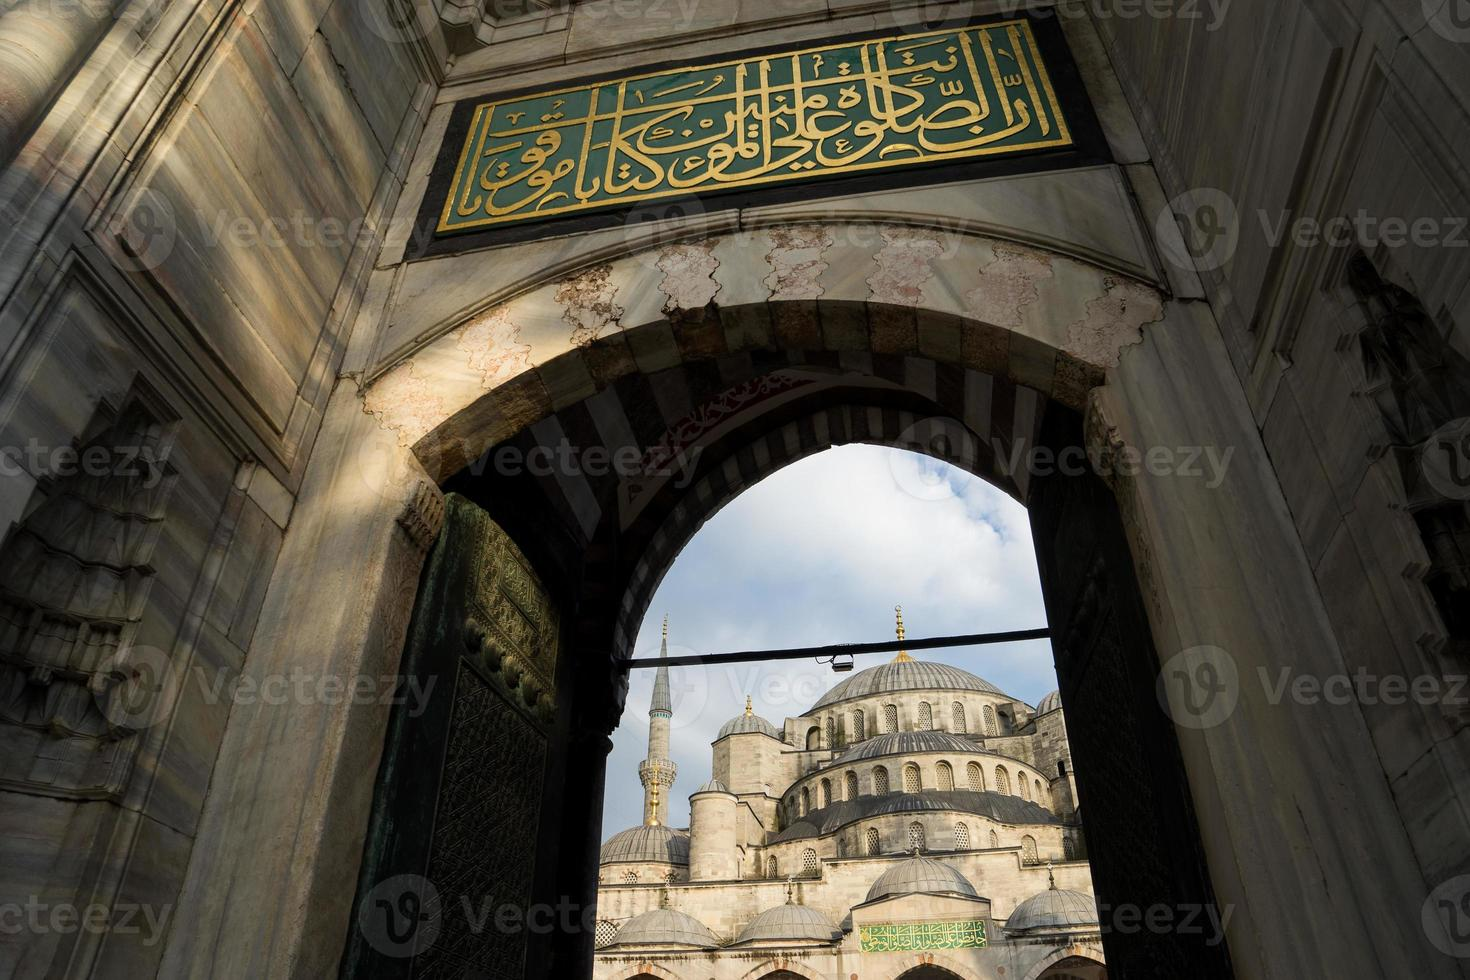 sultan ahmed blå moské, istanbul kalkon foto